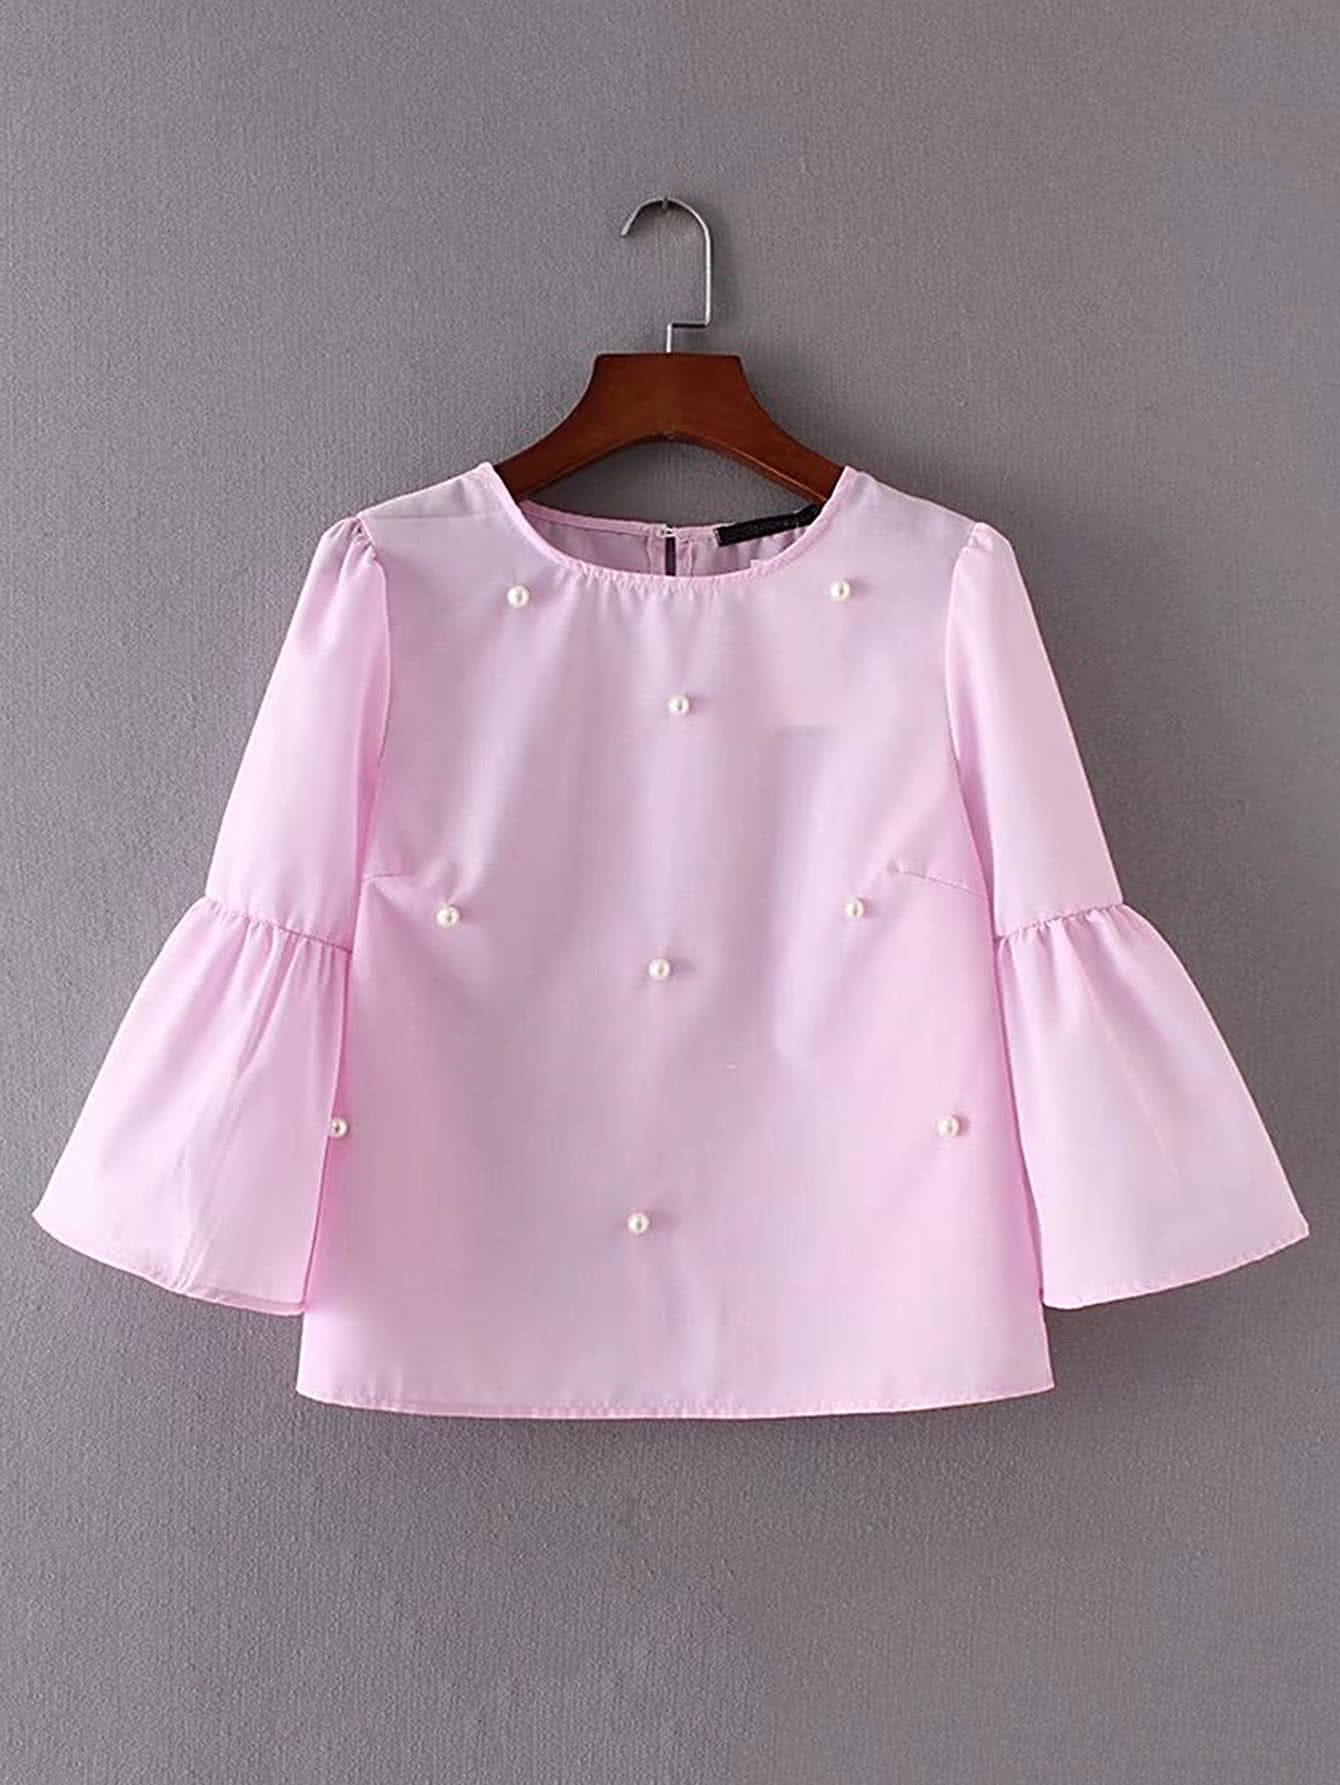 blouse170519201_2